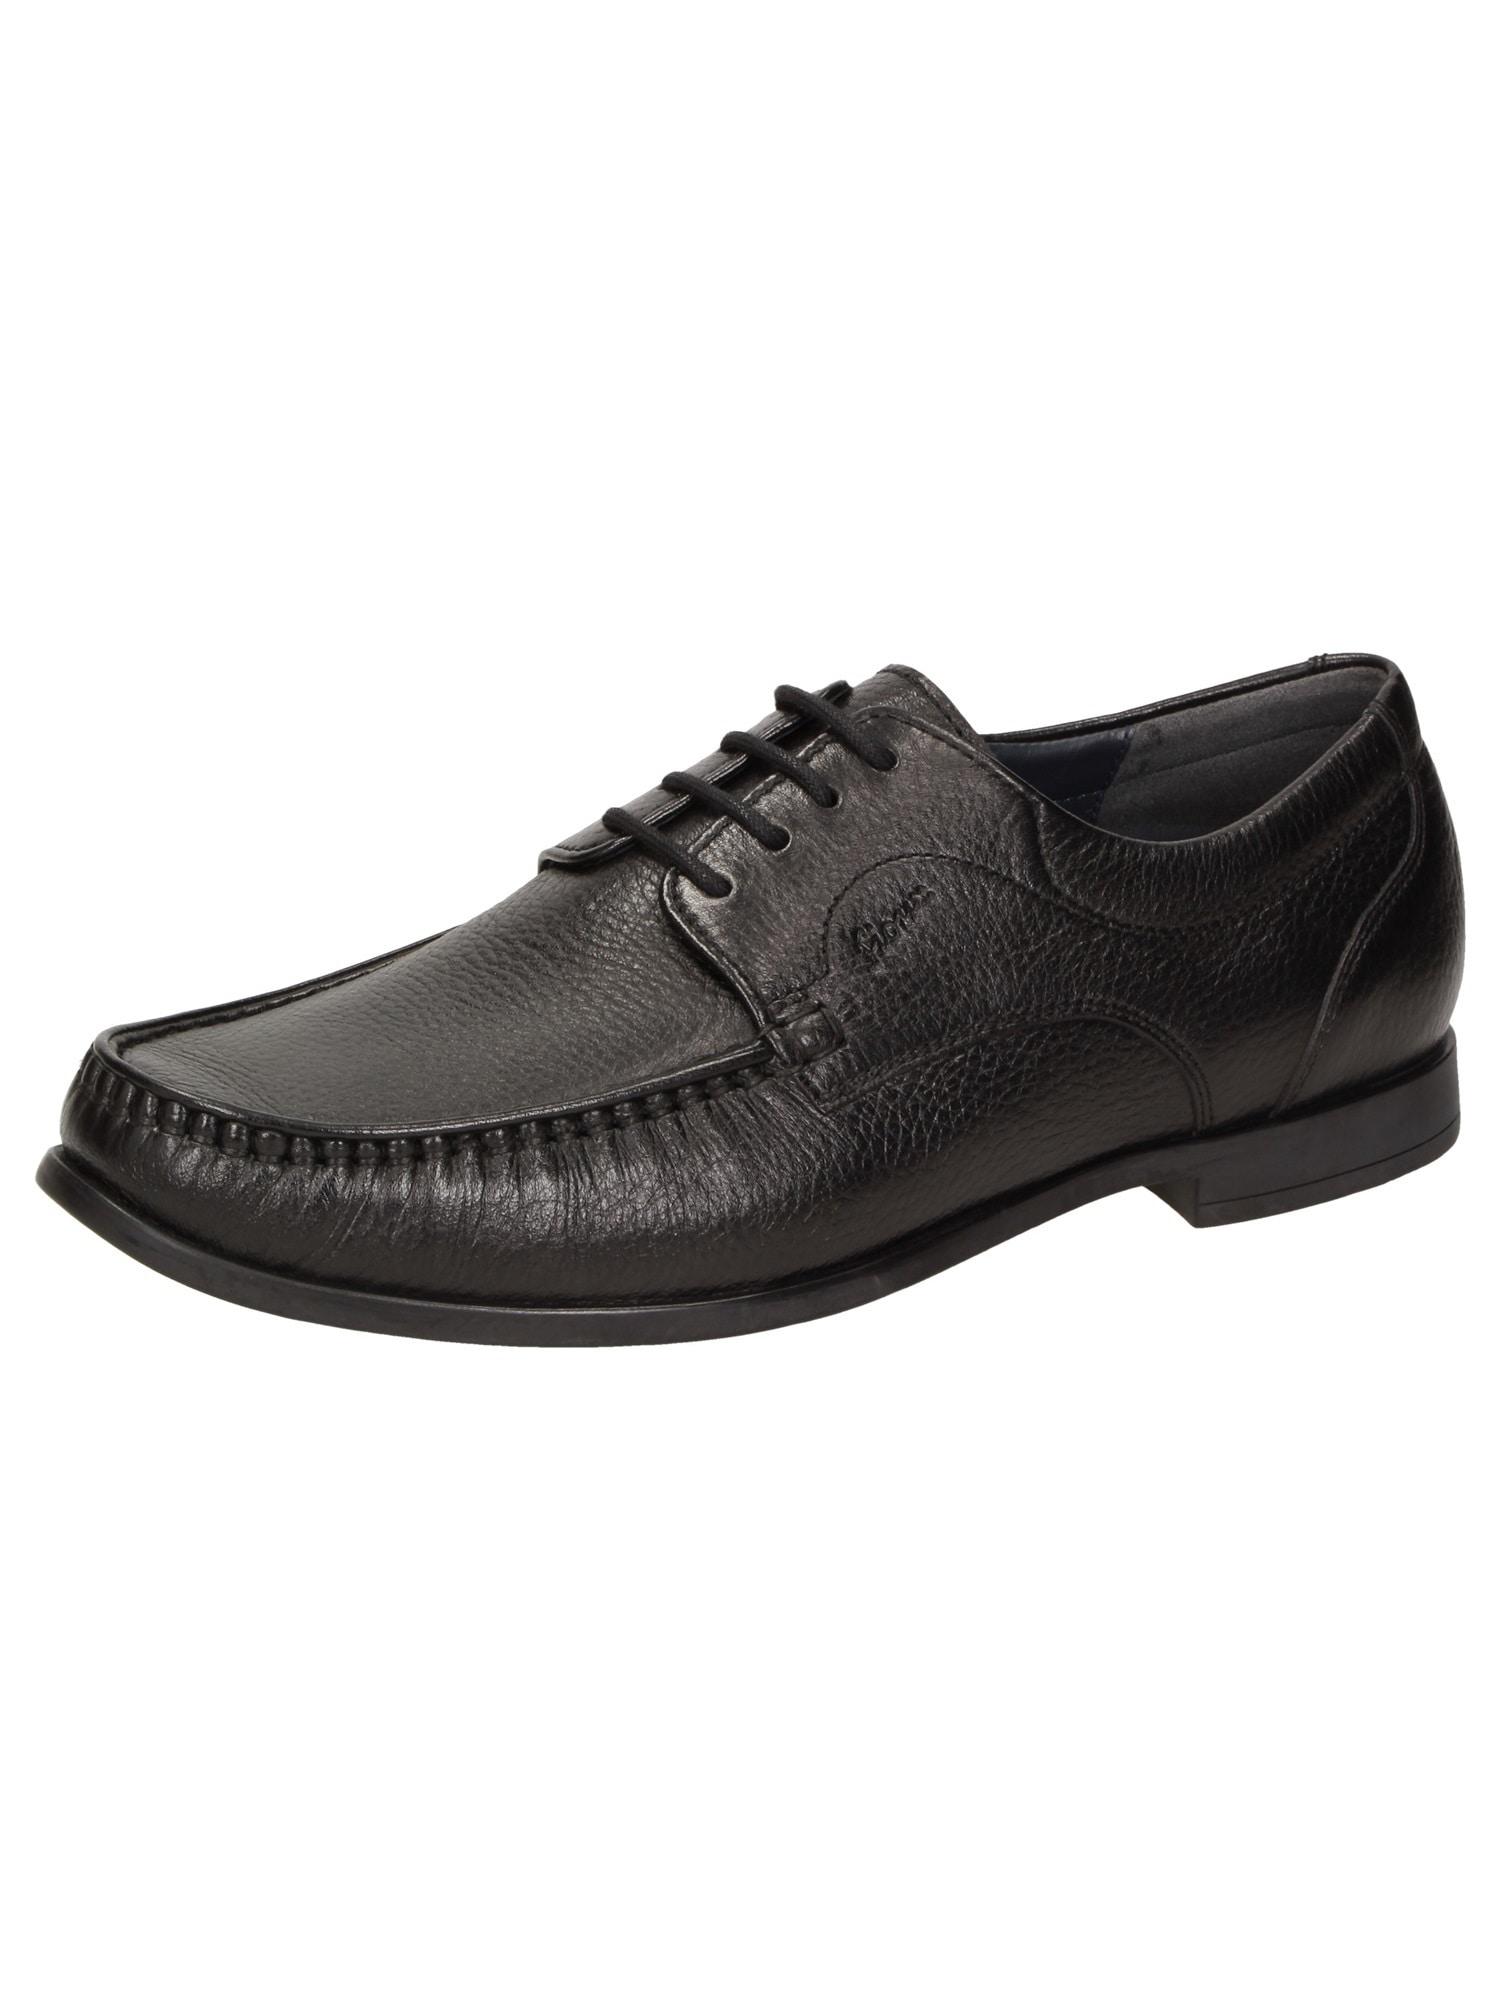 Mokassin ' Edelix-701 '   Schuhe > Mokassins   SIOUX